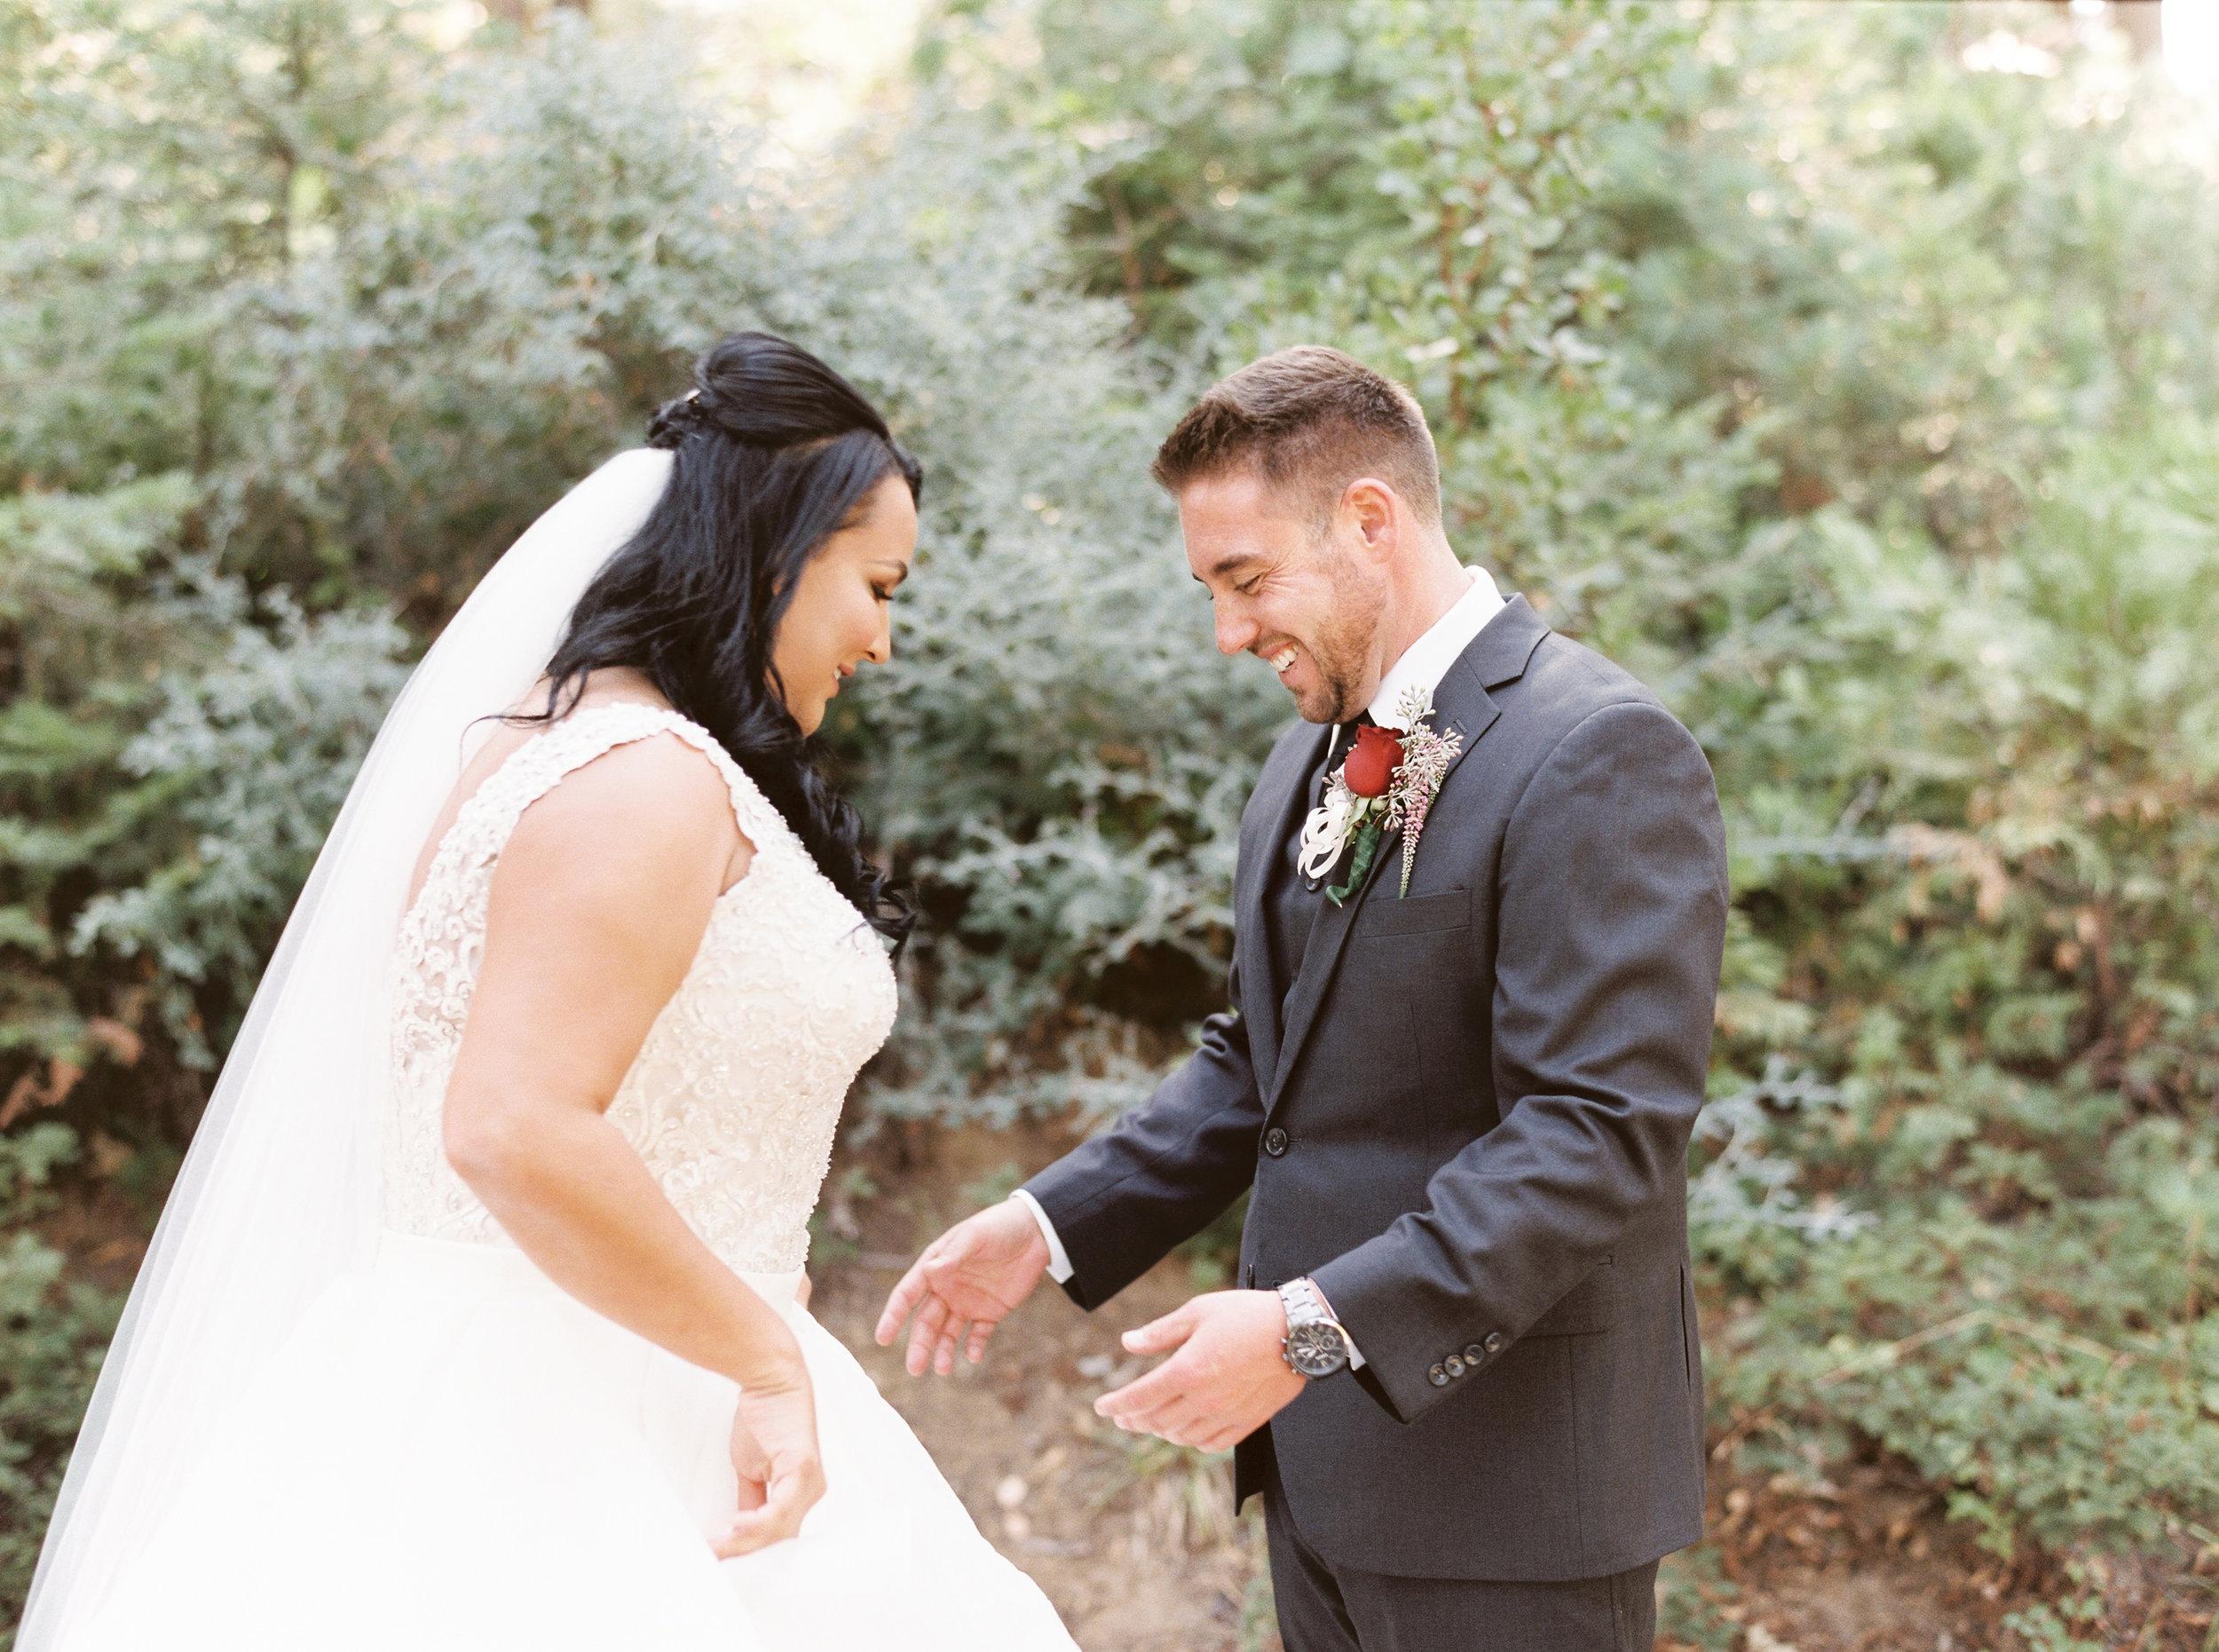 Tenaya-lodge-wedding-at-yosemite-national-park-california-63.jpg